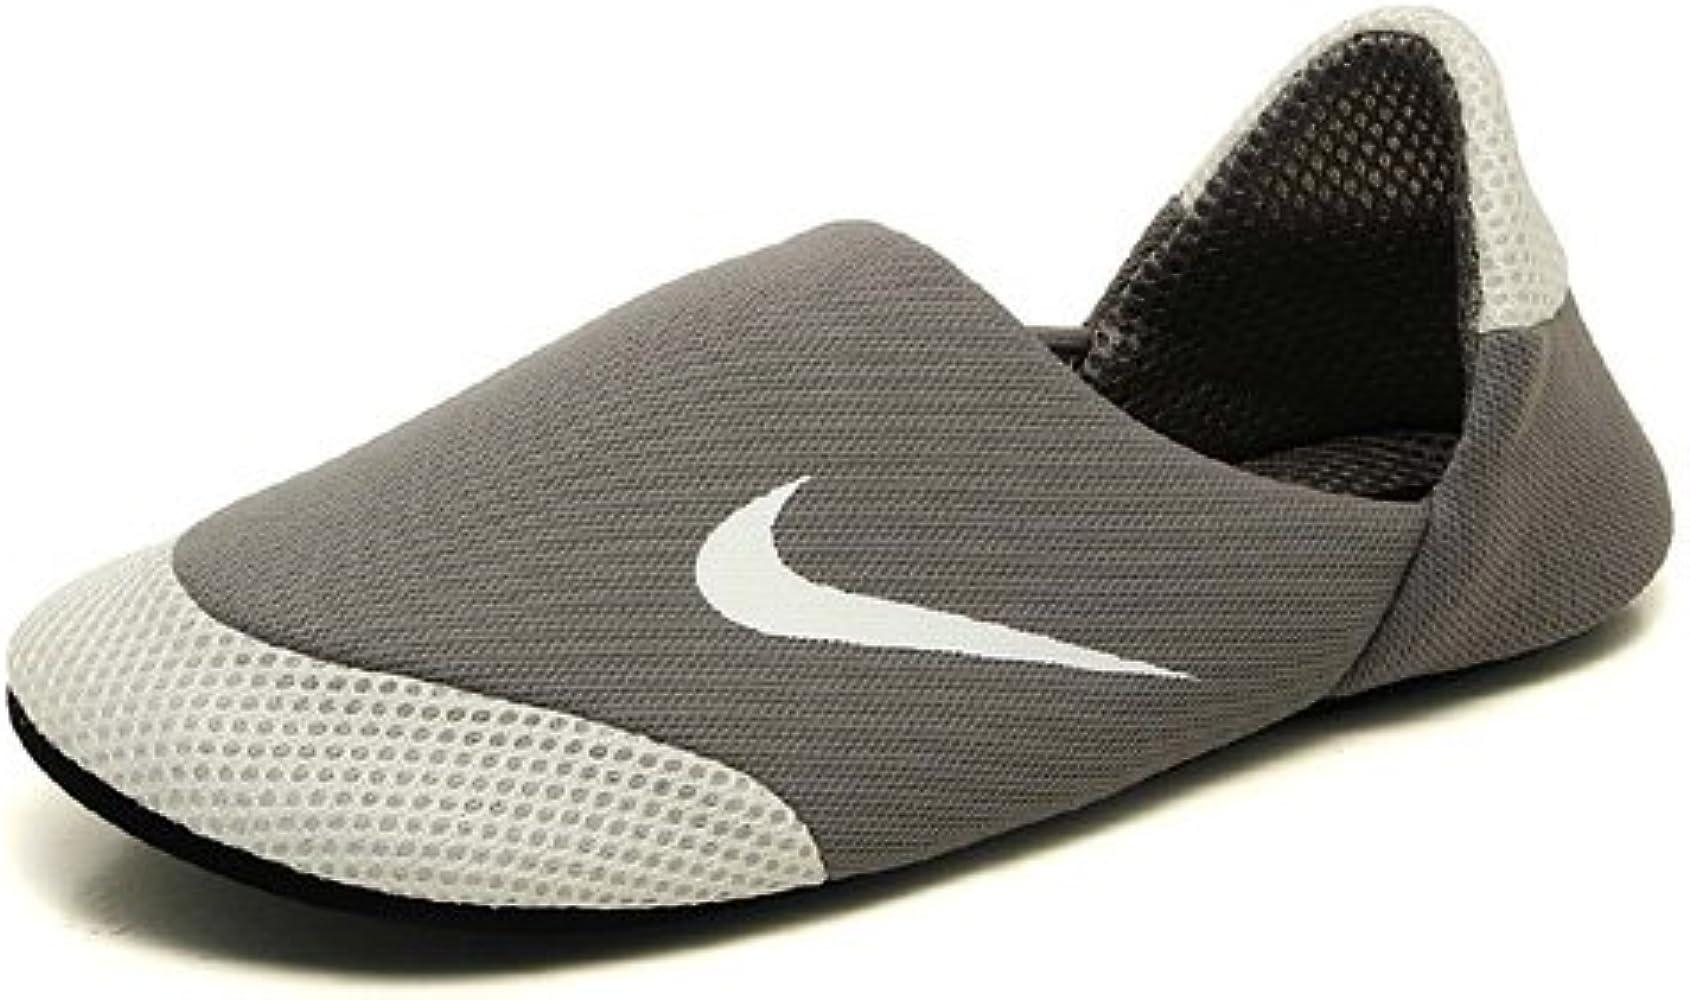 Nike Lebron XIII ID, Zapatillas de Baloncesto para Hombre, Negro ...